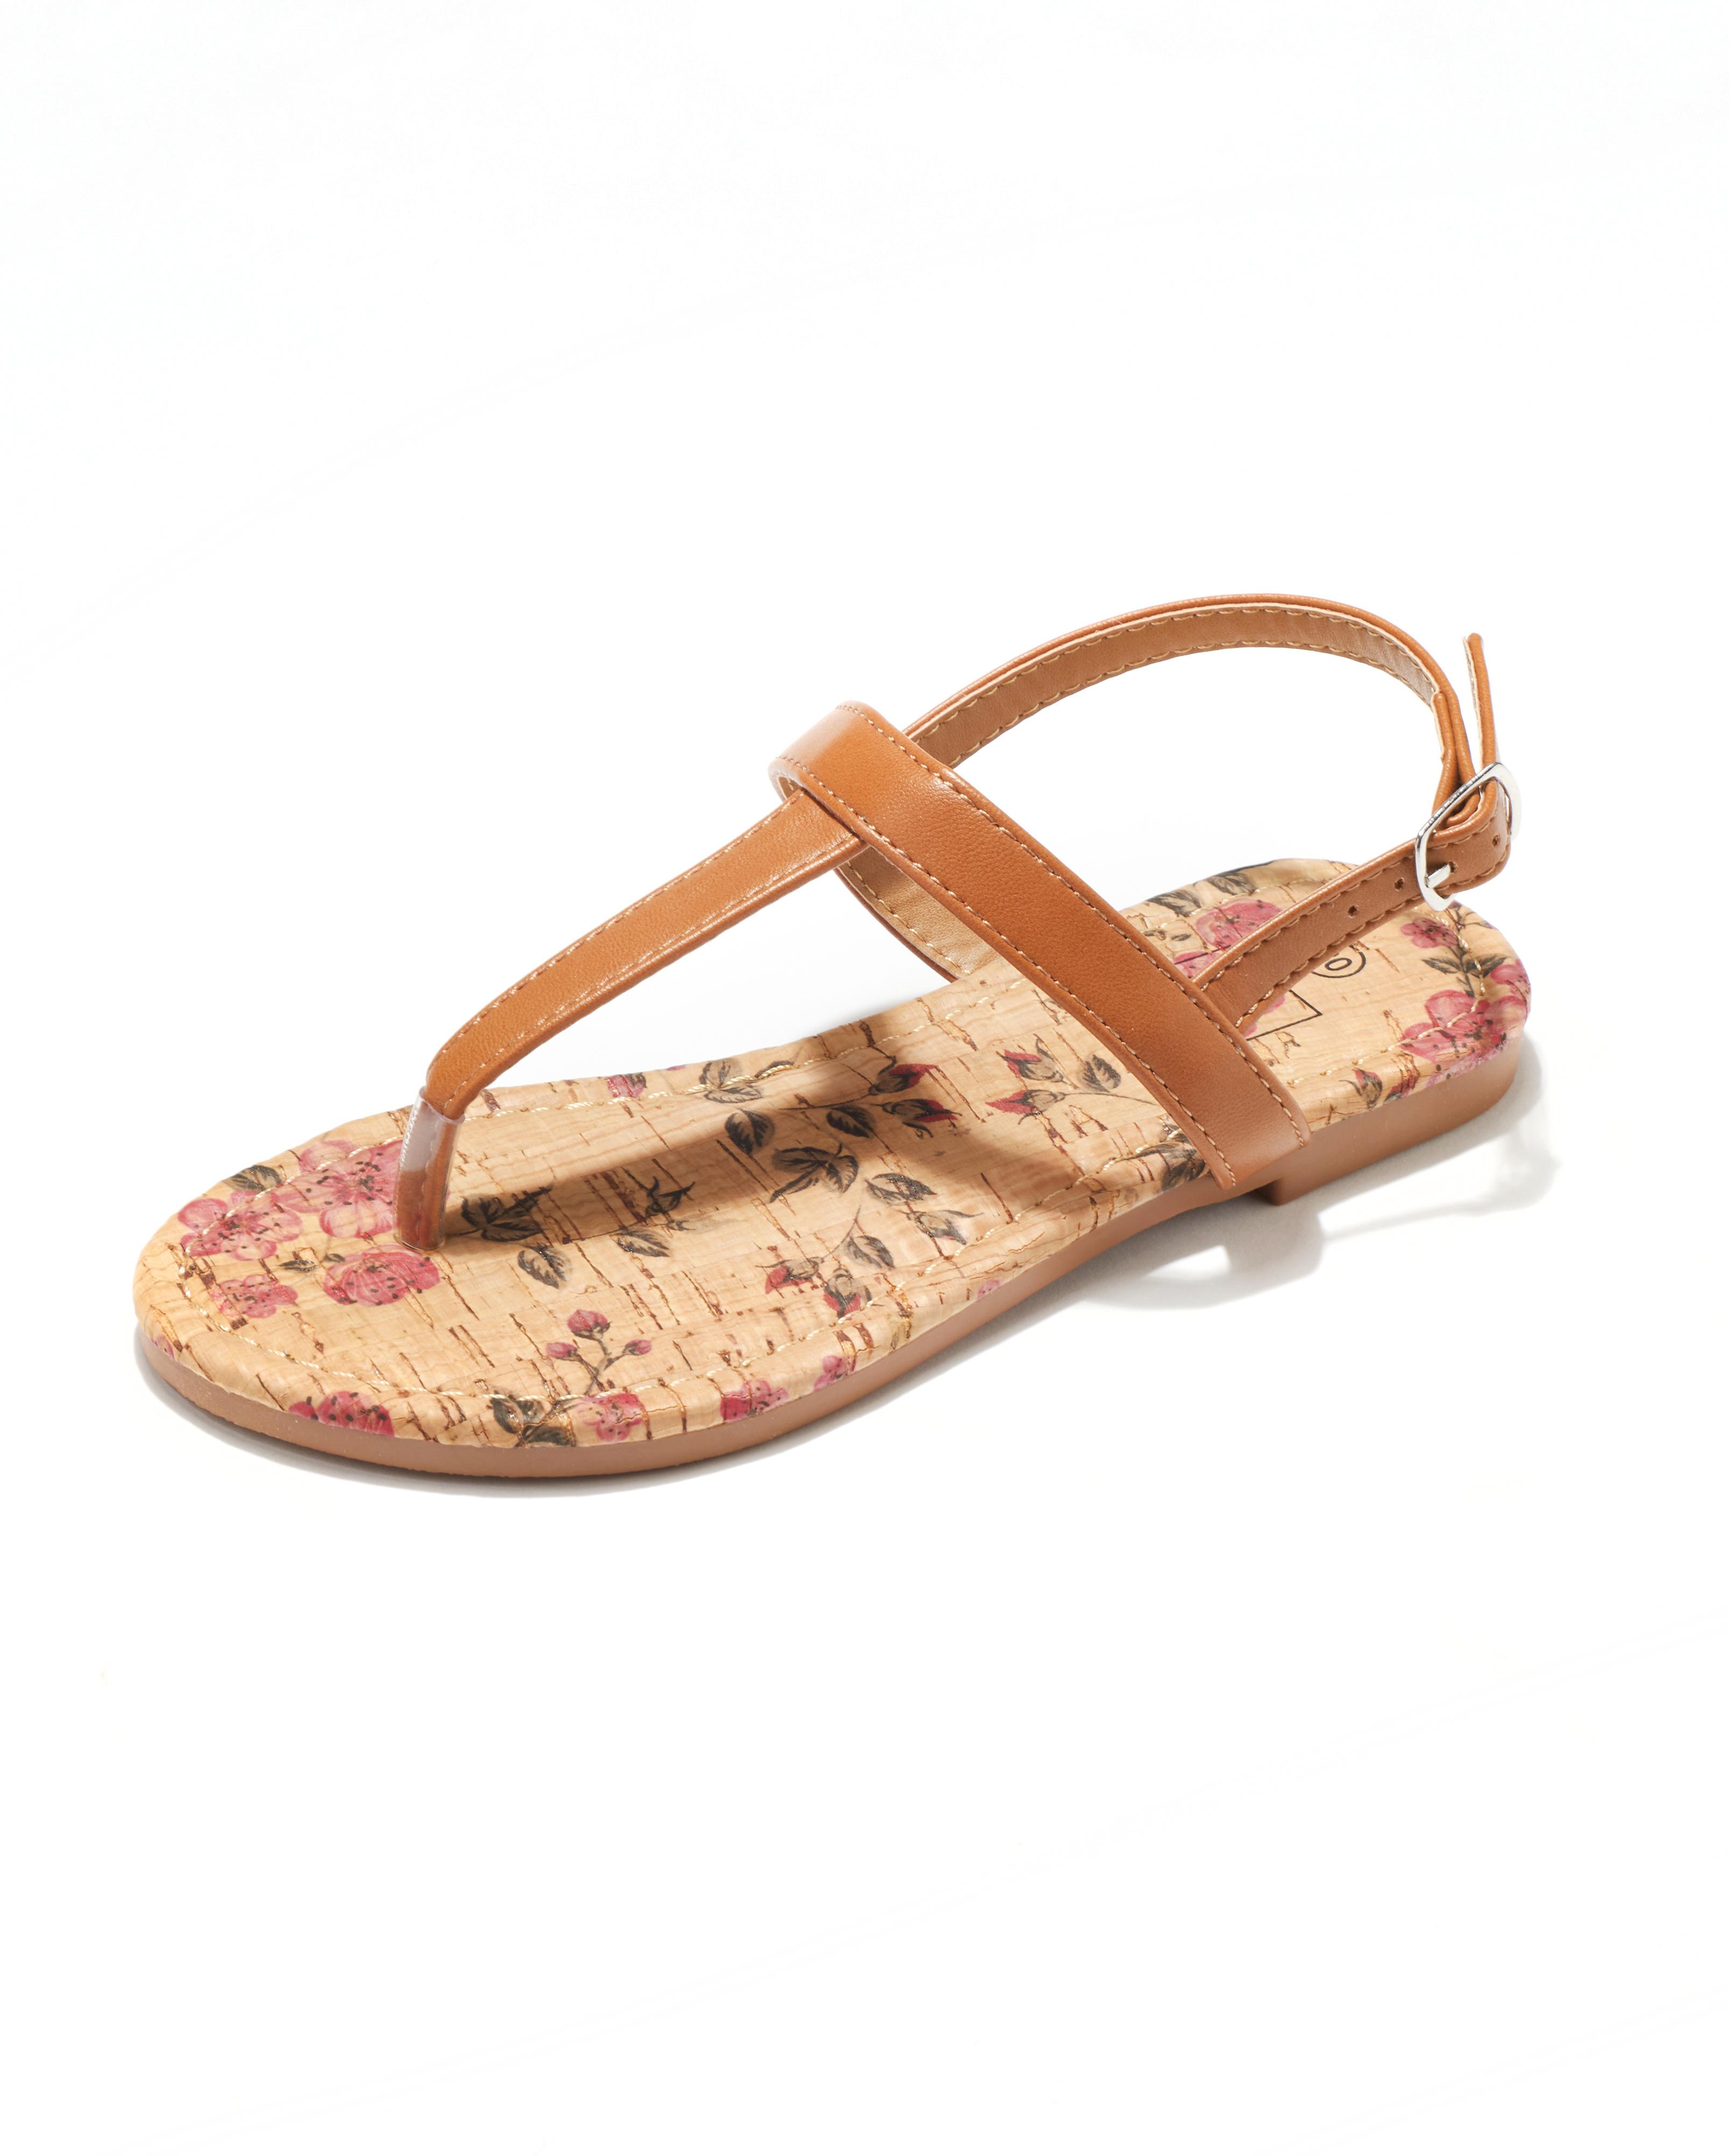 Sandales Fille - Sandale Ouverte Camel Jina - Saou Freewalk3 Jf